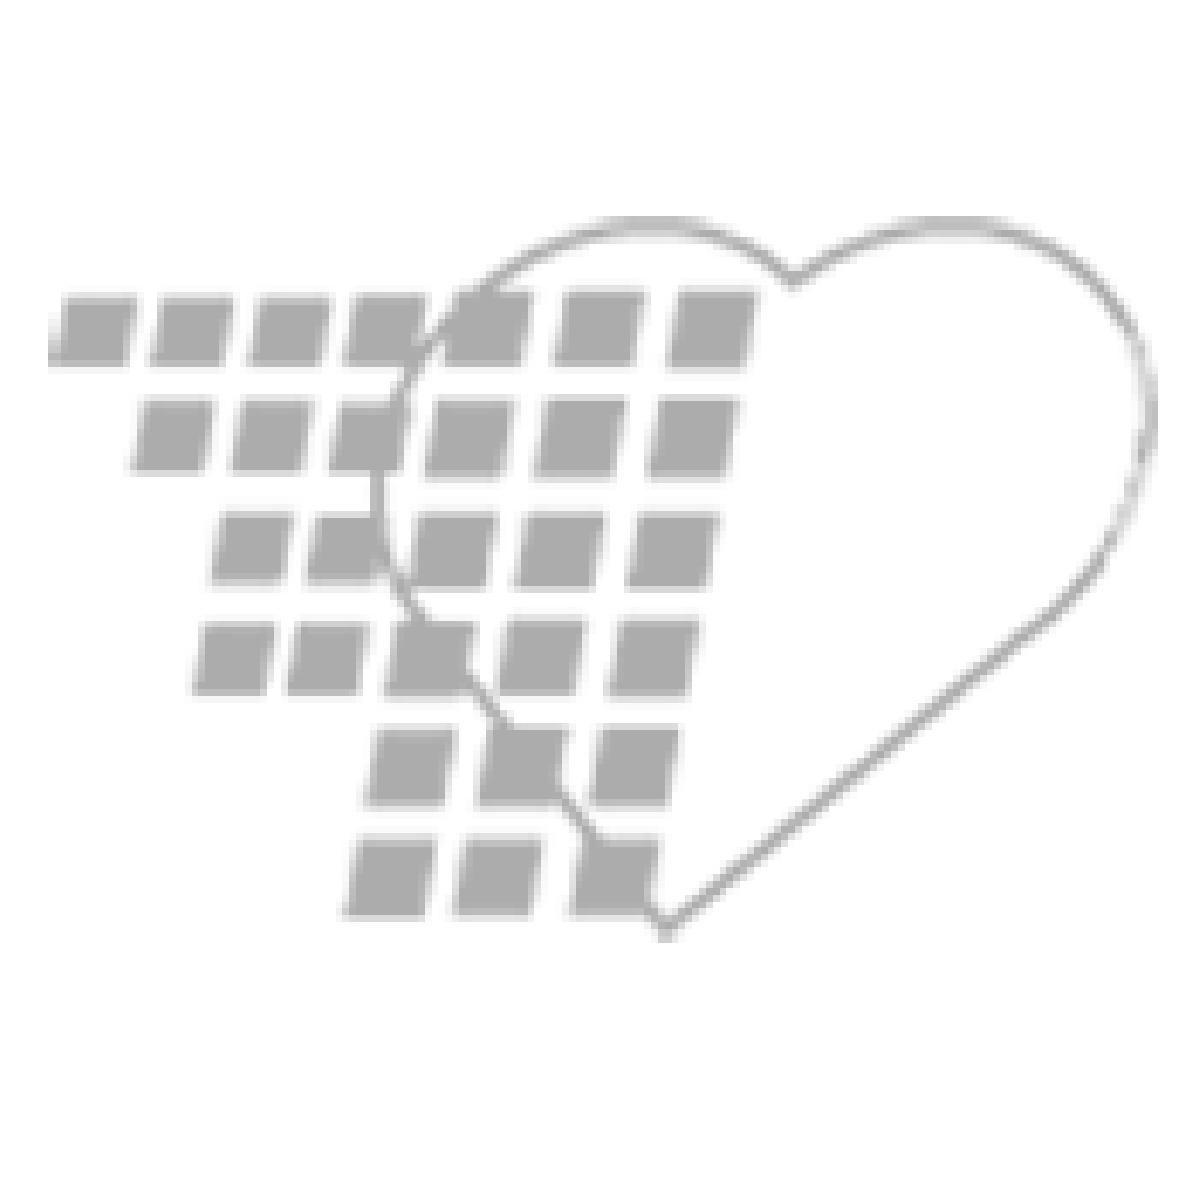 06-93-2020 - Demo Dose® 75/25 Insuln 100 units mL 10 mL